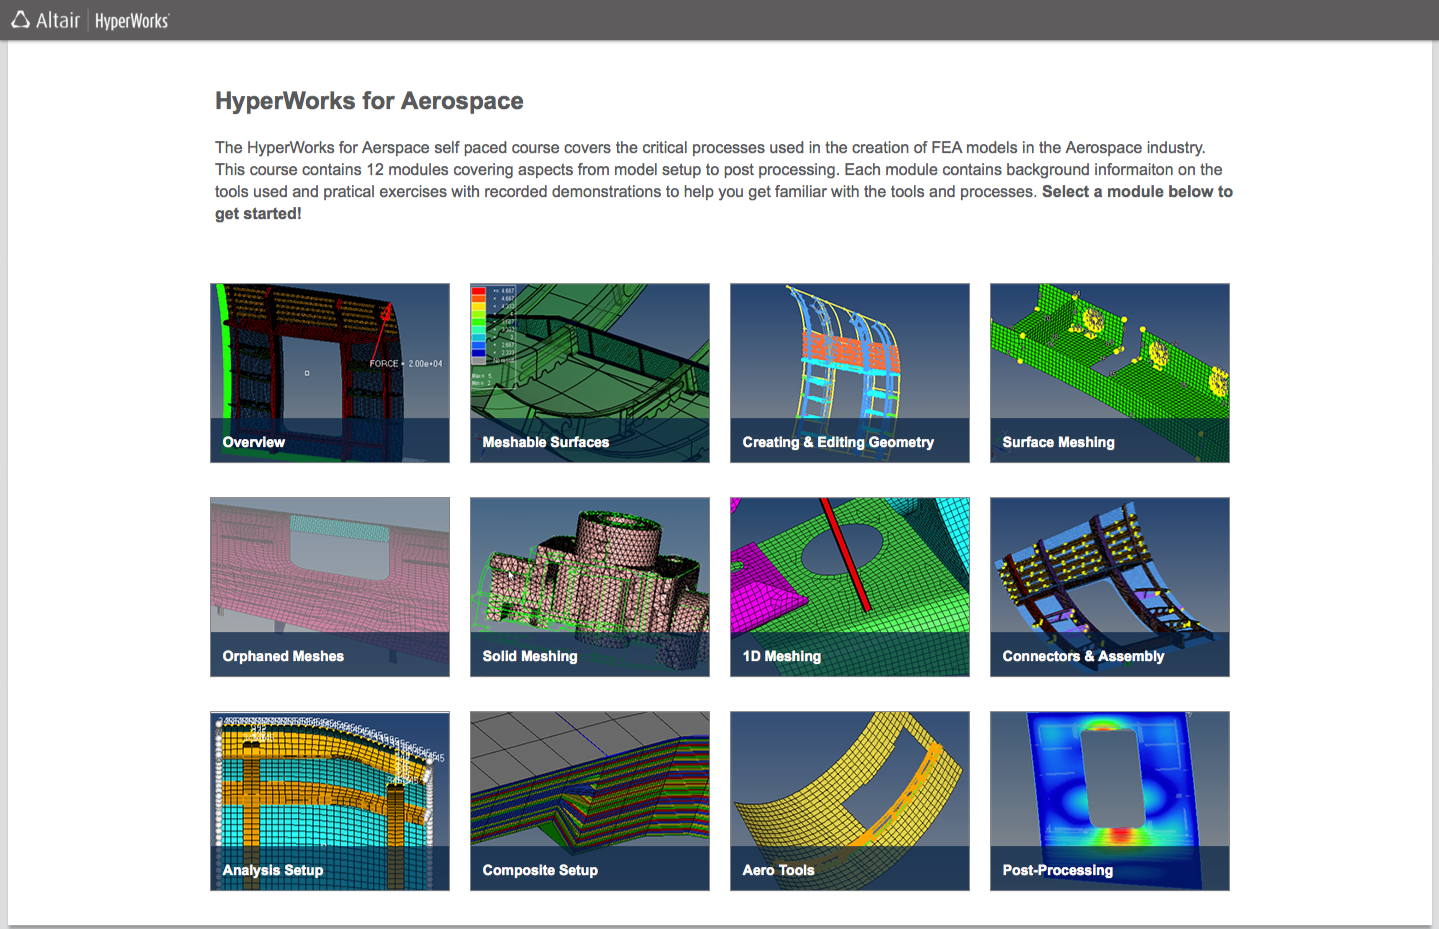 HyperWorks for Aerospace